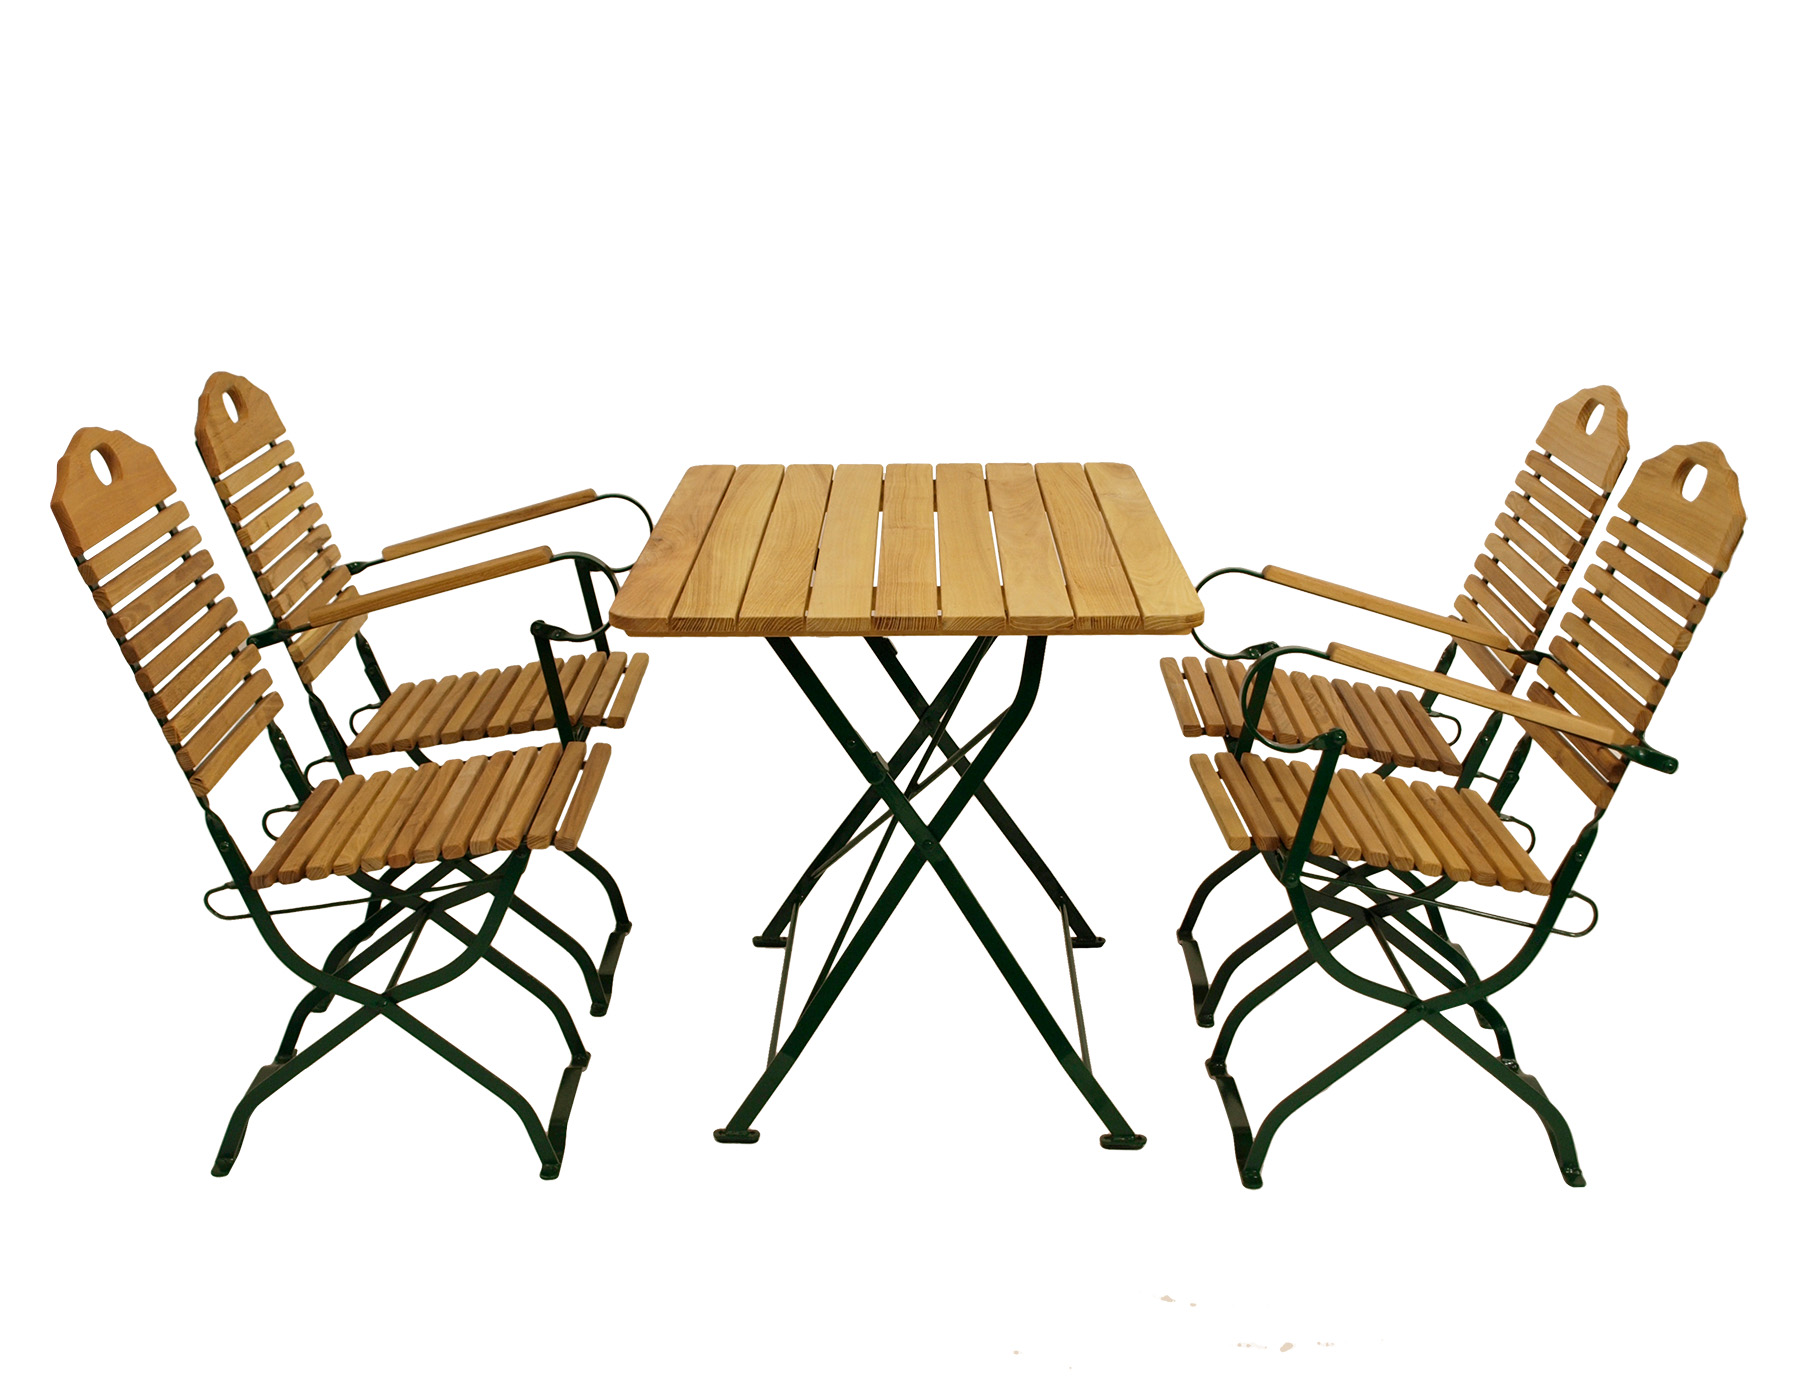 Kurgarten - Garnitur BAD TÖLZ 5-teilig, Flachstahl grün + Robinie, klappbar